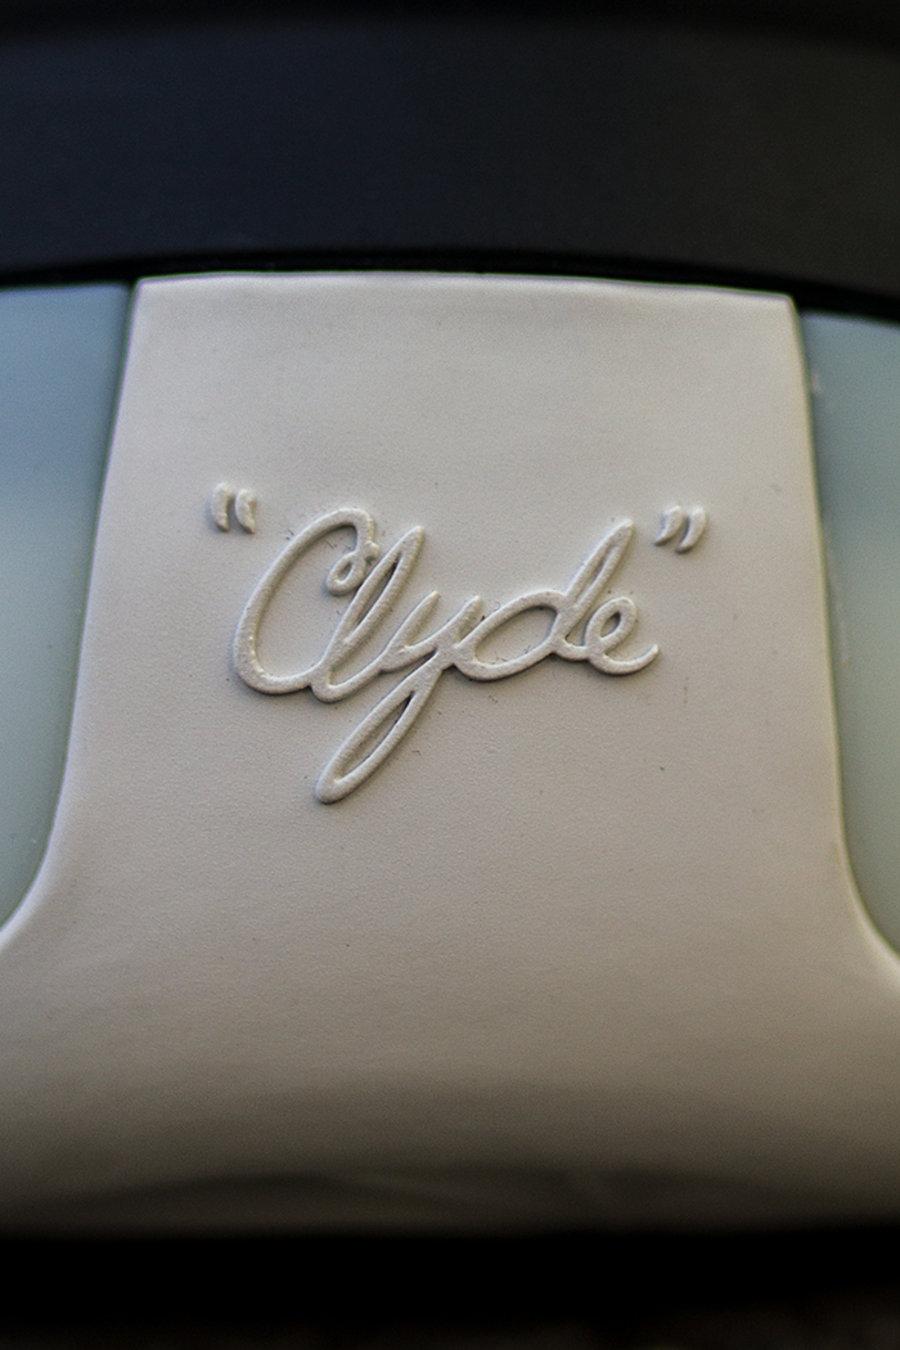 PUMA,Clyde Hardwood,193663-01, 千元以内的全能战靴!能凹造型能实战!小编安利晚了!